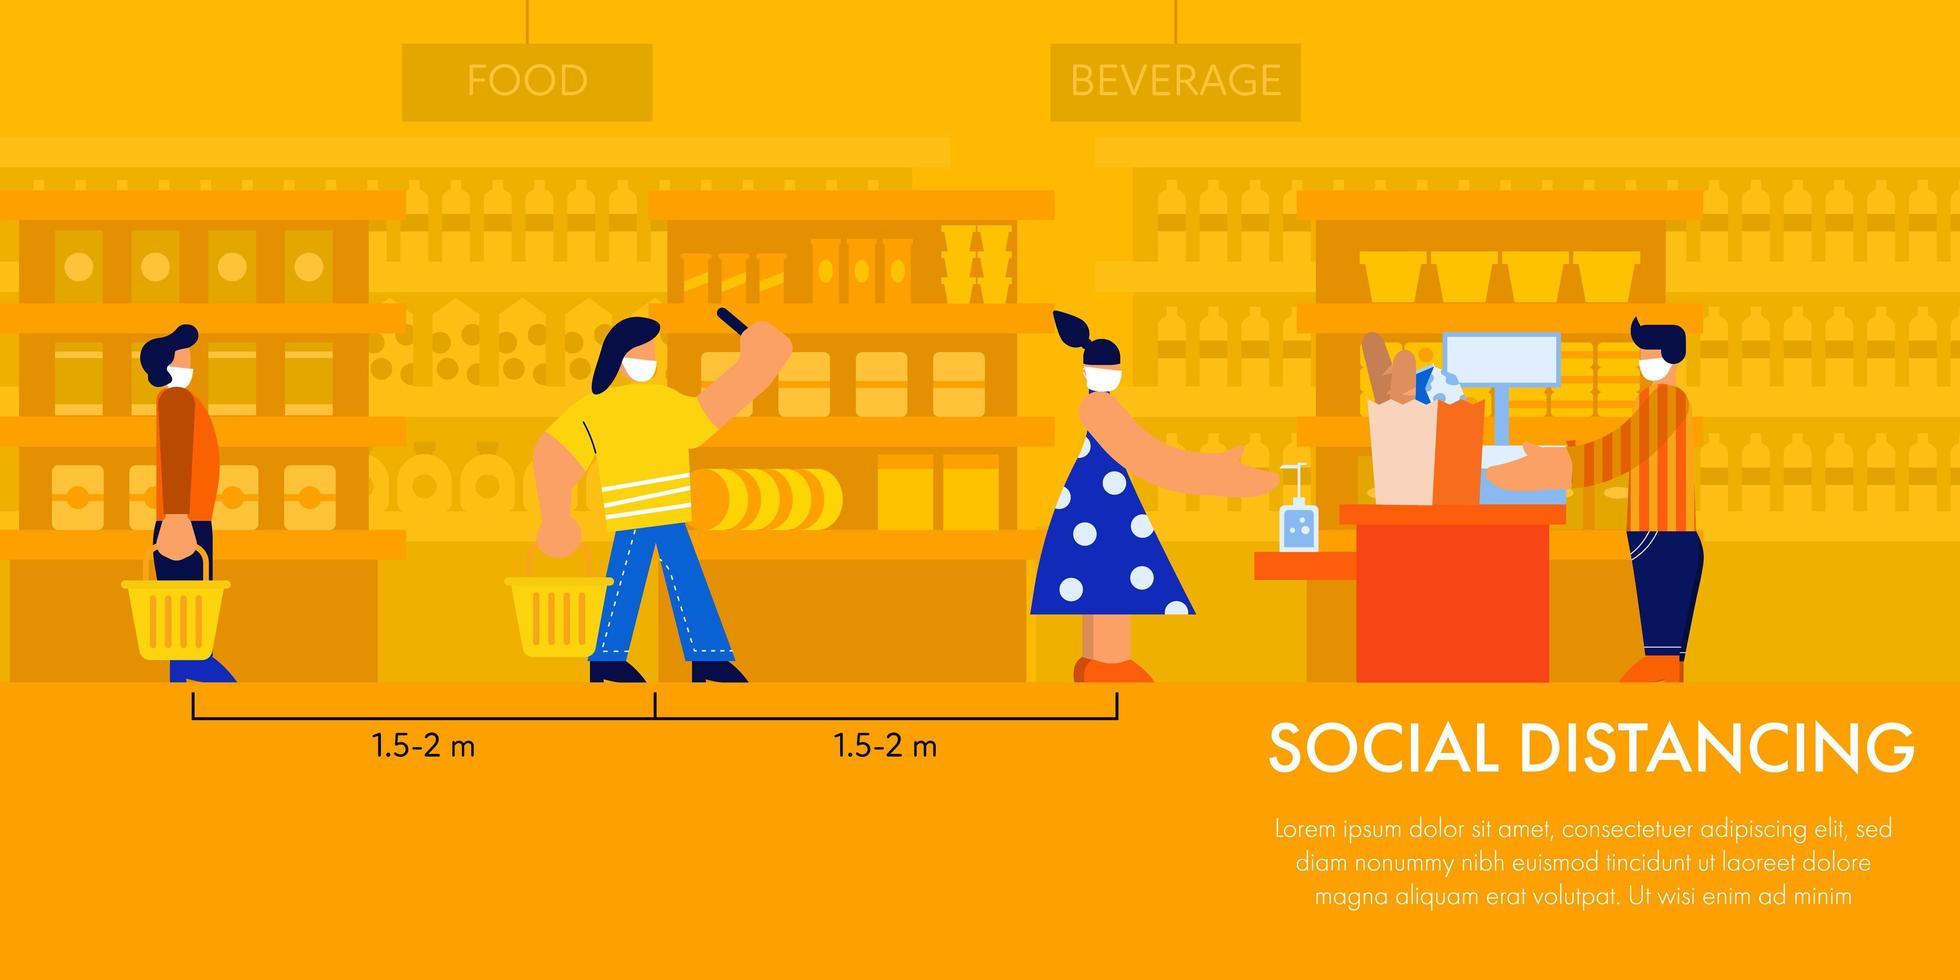 distanciamento social na fila do supermercado vetor